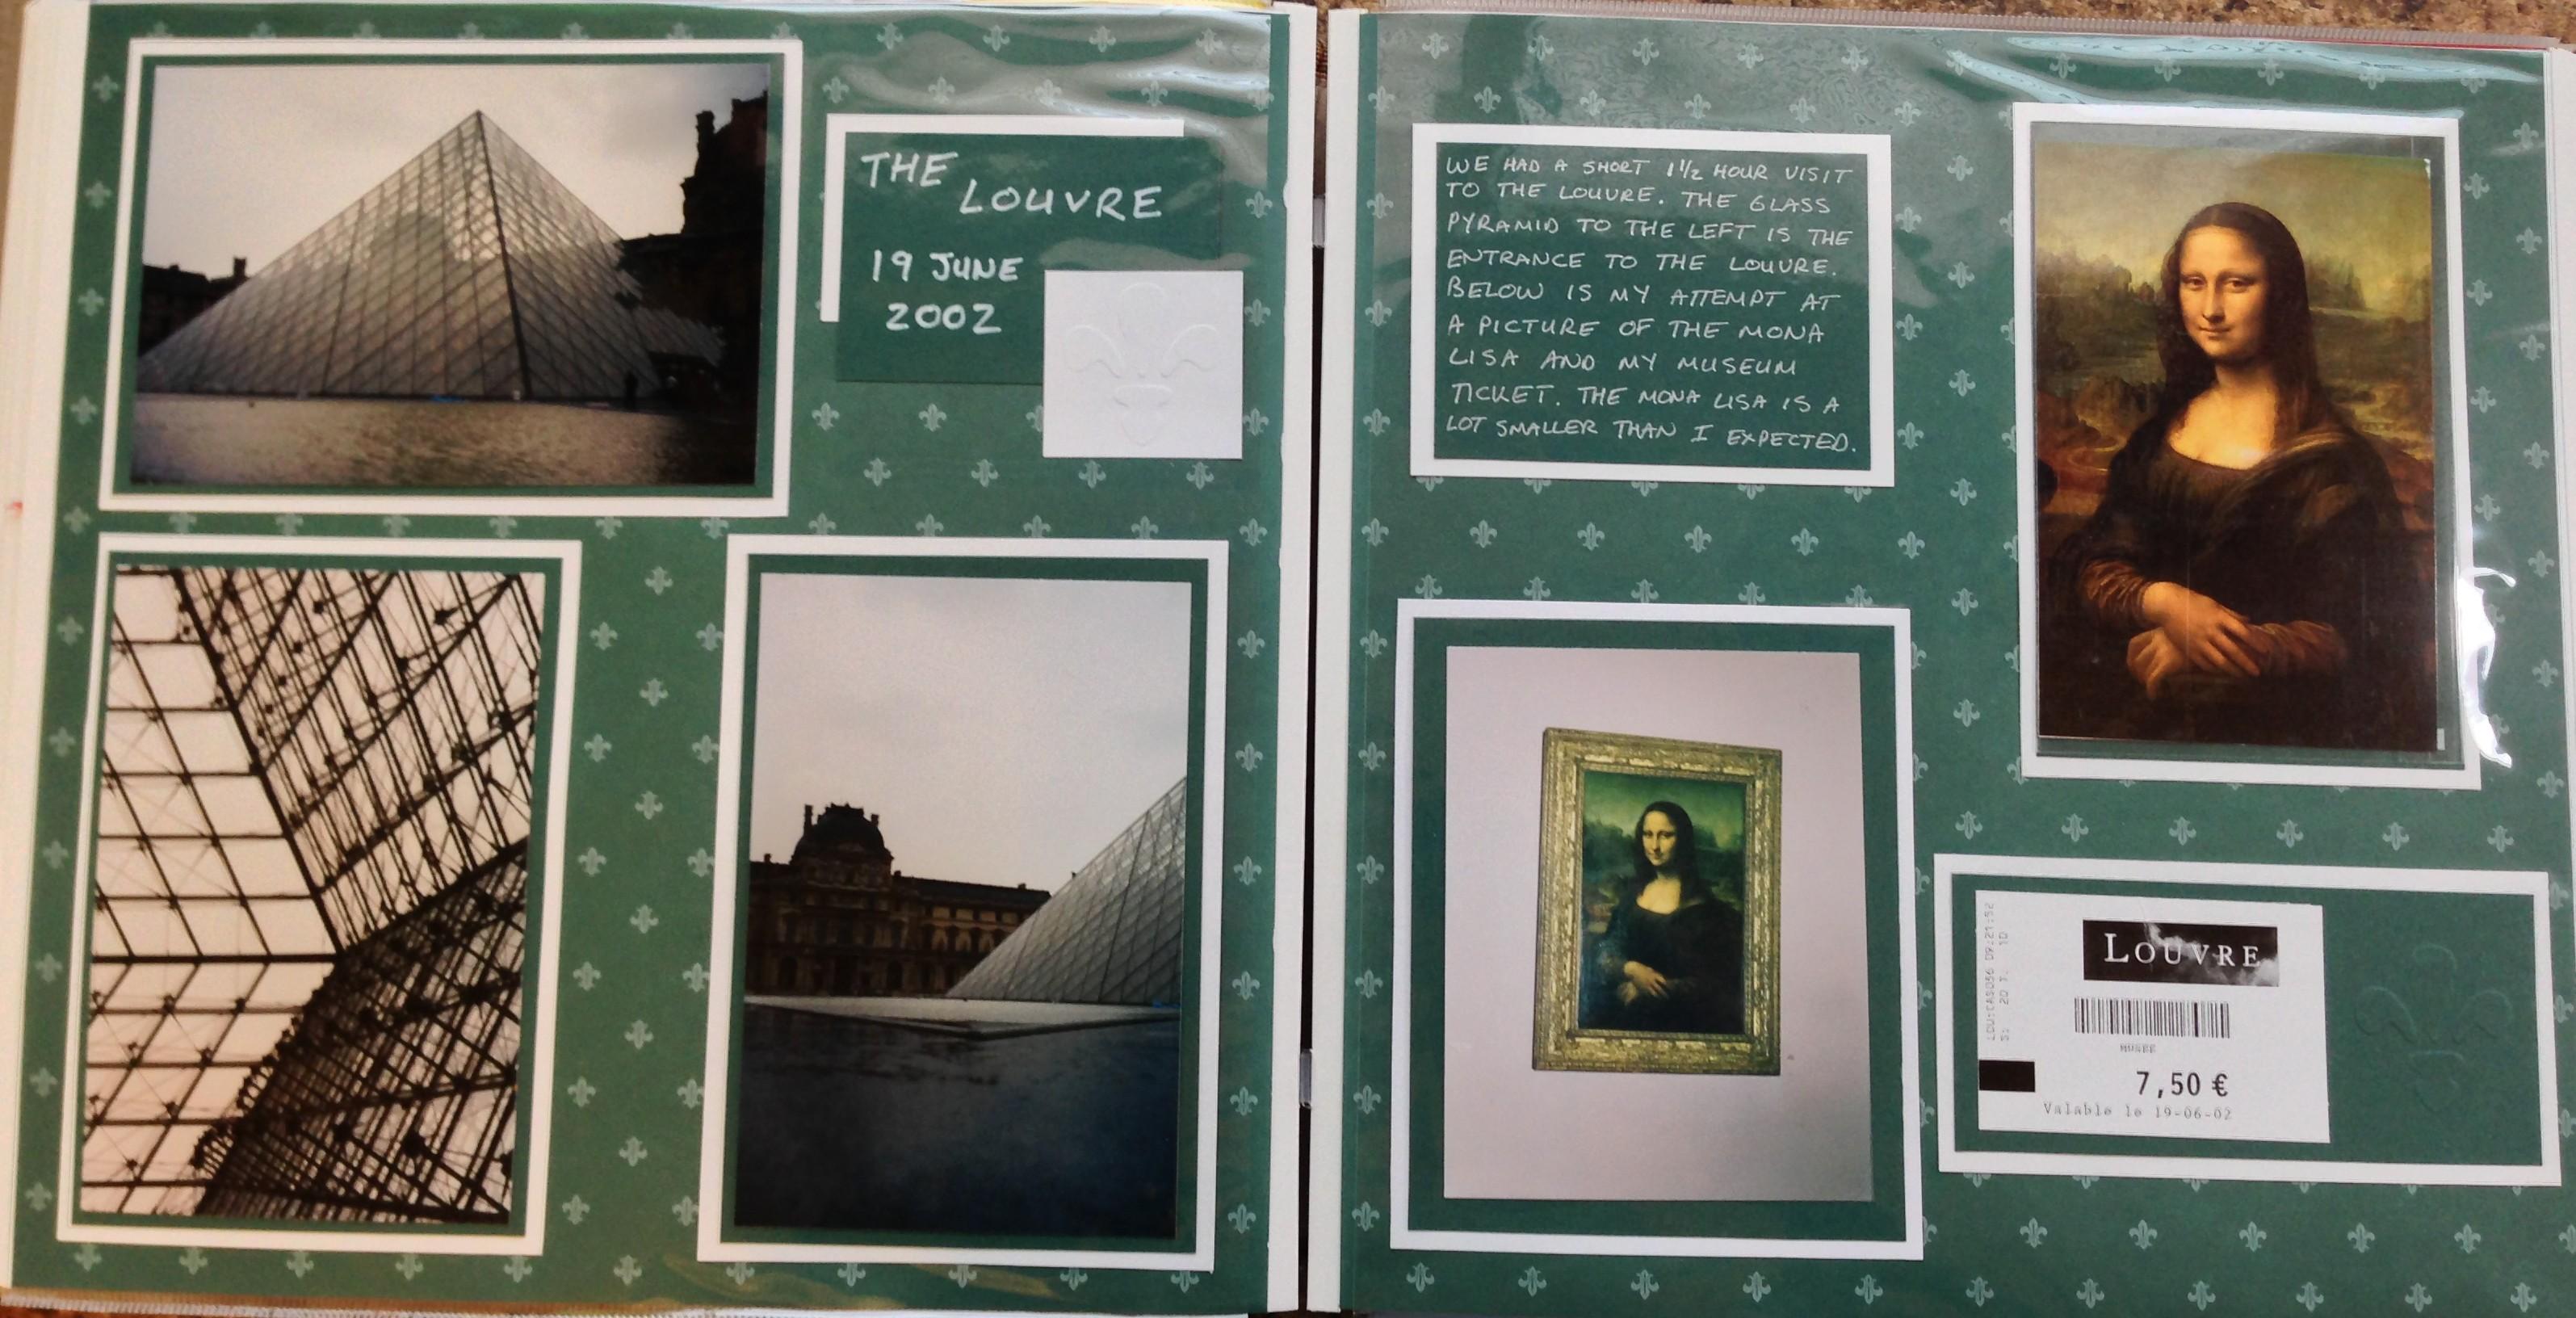 Europe scrapbook ideas - Europe Vacation Louvre